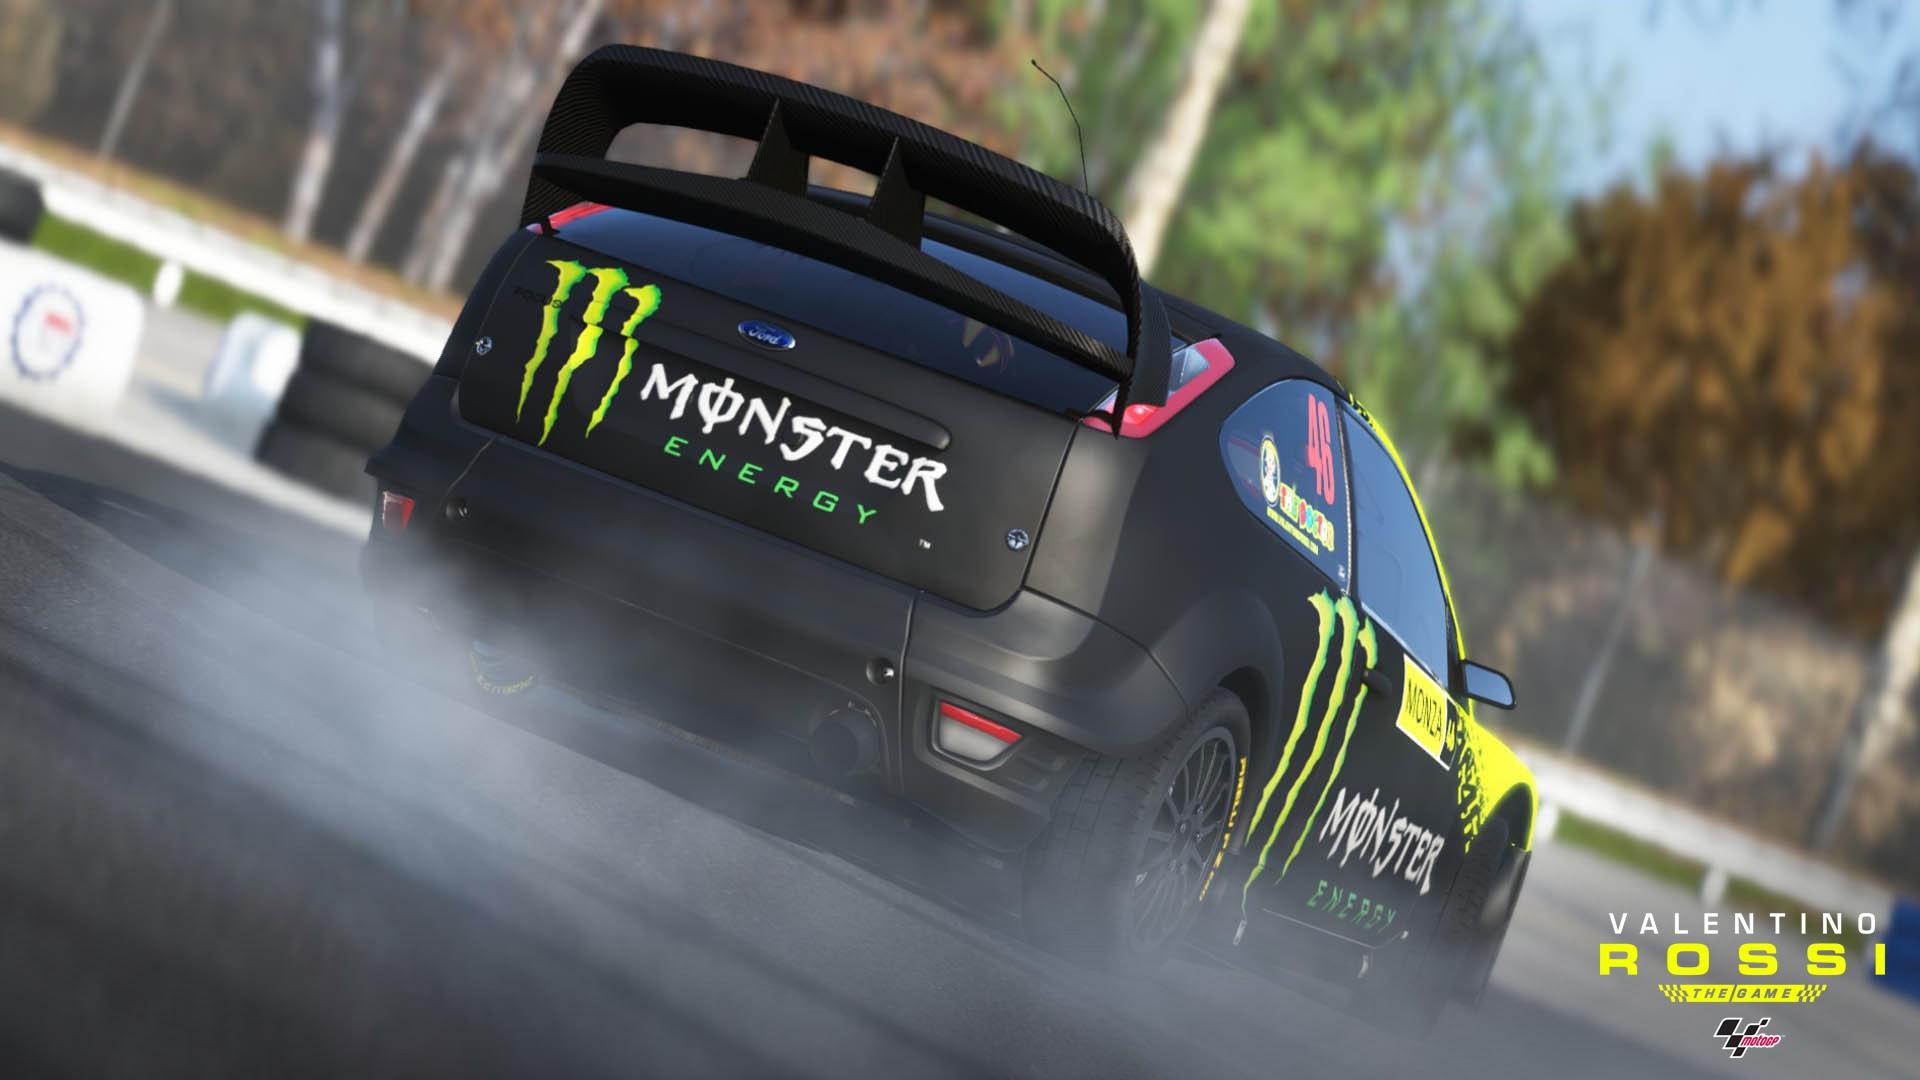 Valentino Rossi: The Game - Gameinfos | pressakey.com